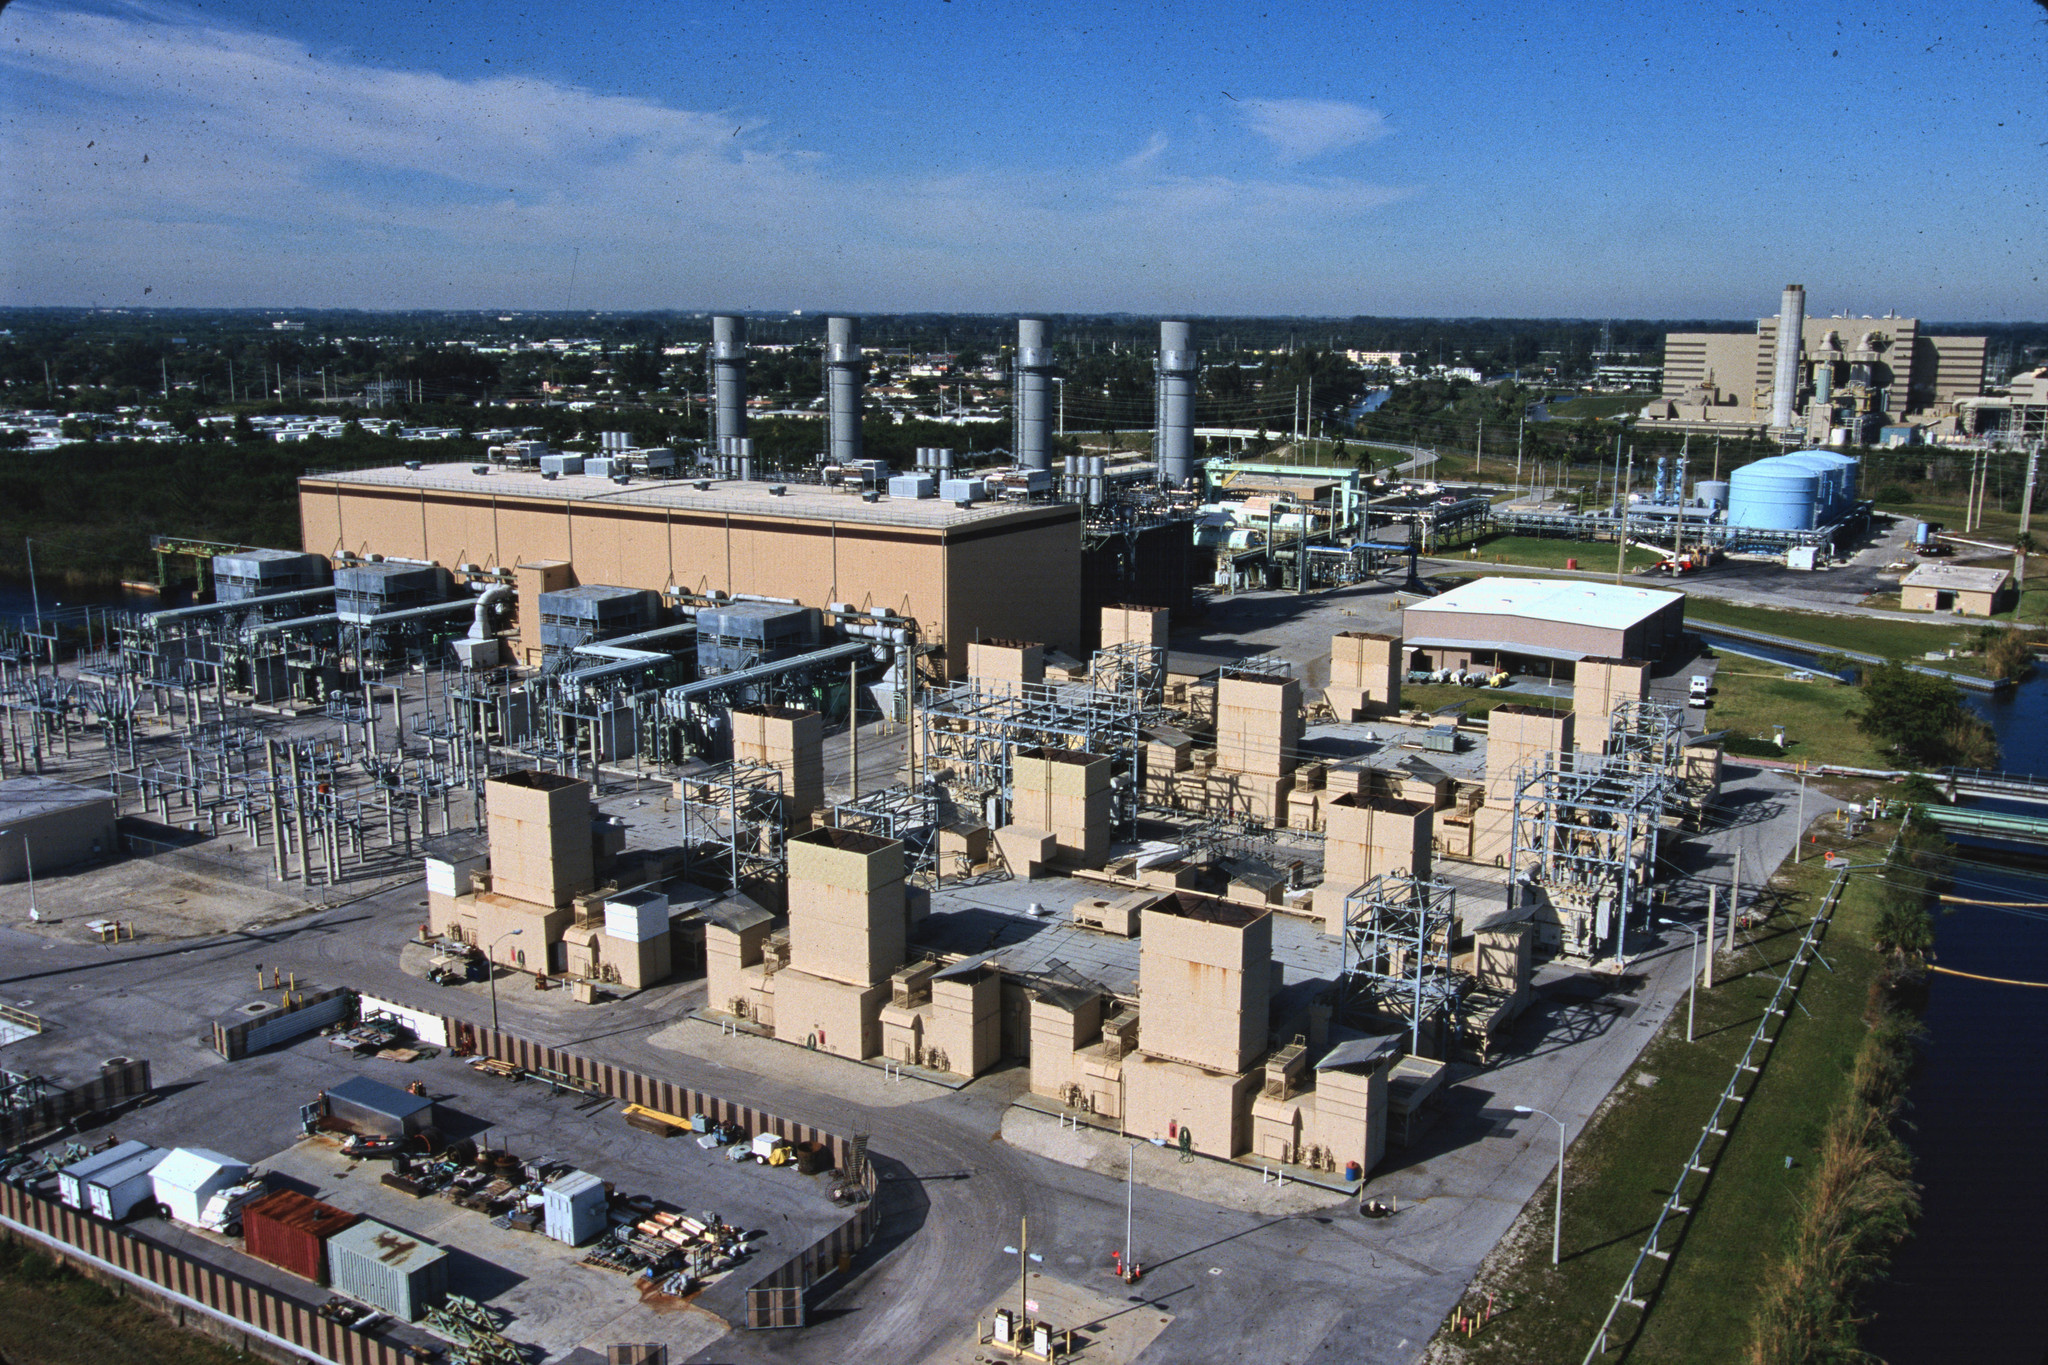 FPL pre-qualifies Miami-Dade locale for data centers - Sun